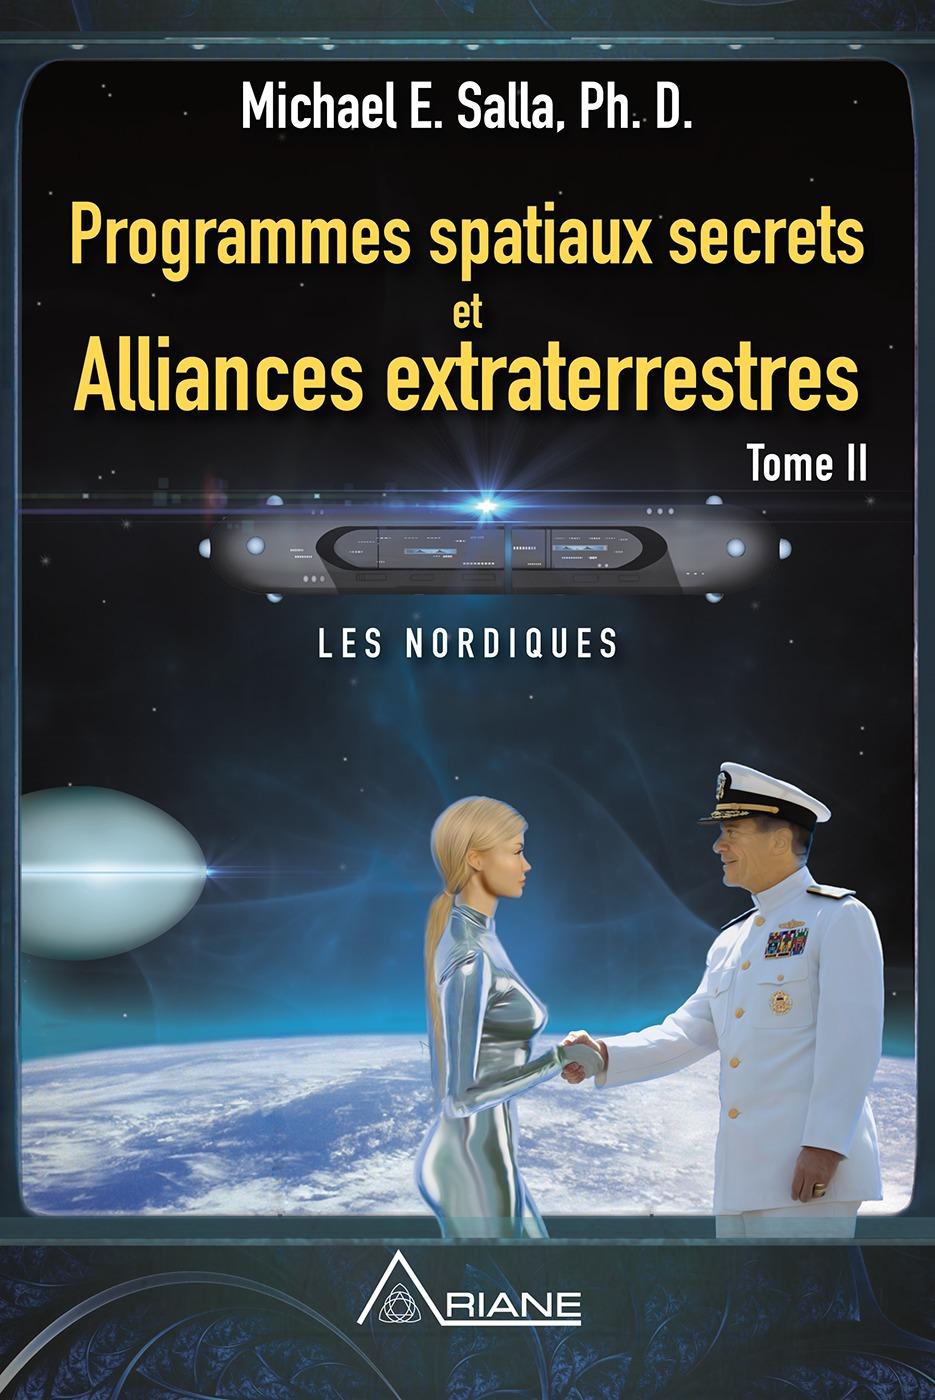 Michael E. Salla Programmes spatiaux secrets et alliances extraterrestres, tome II